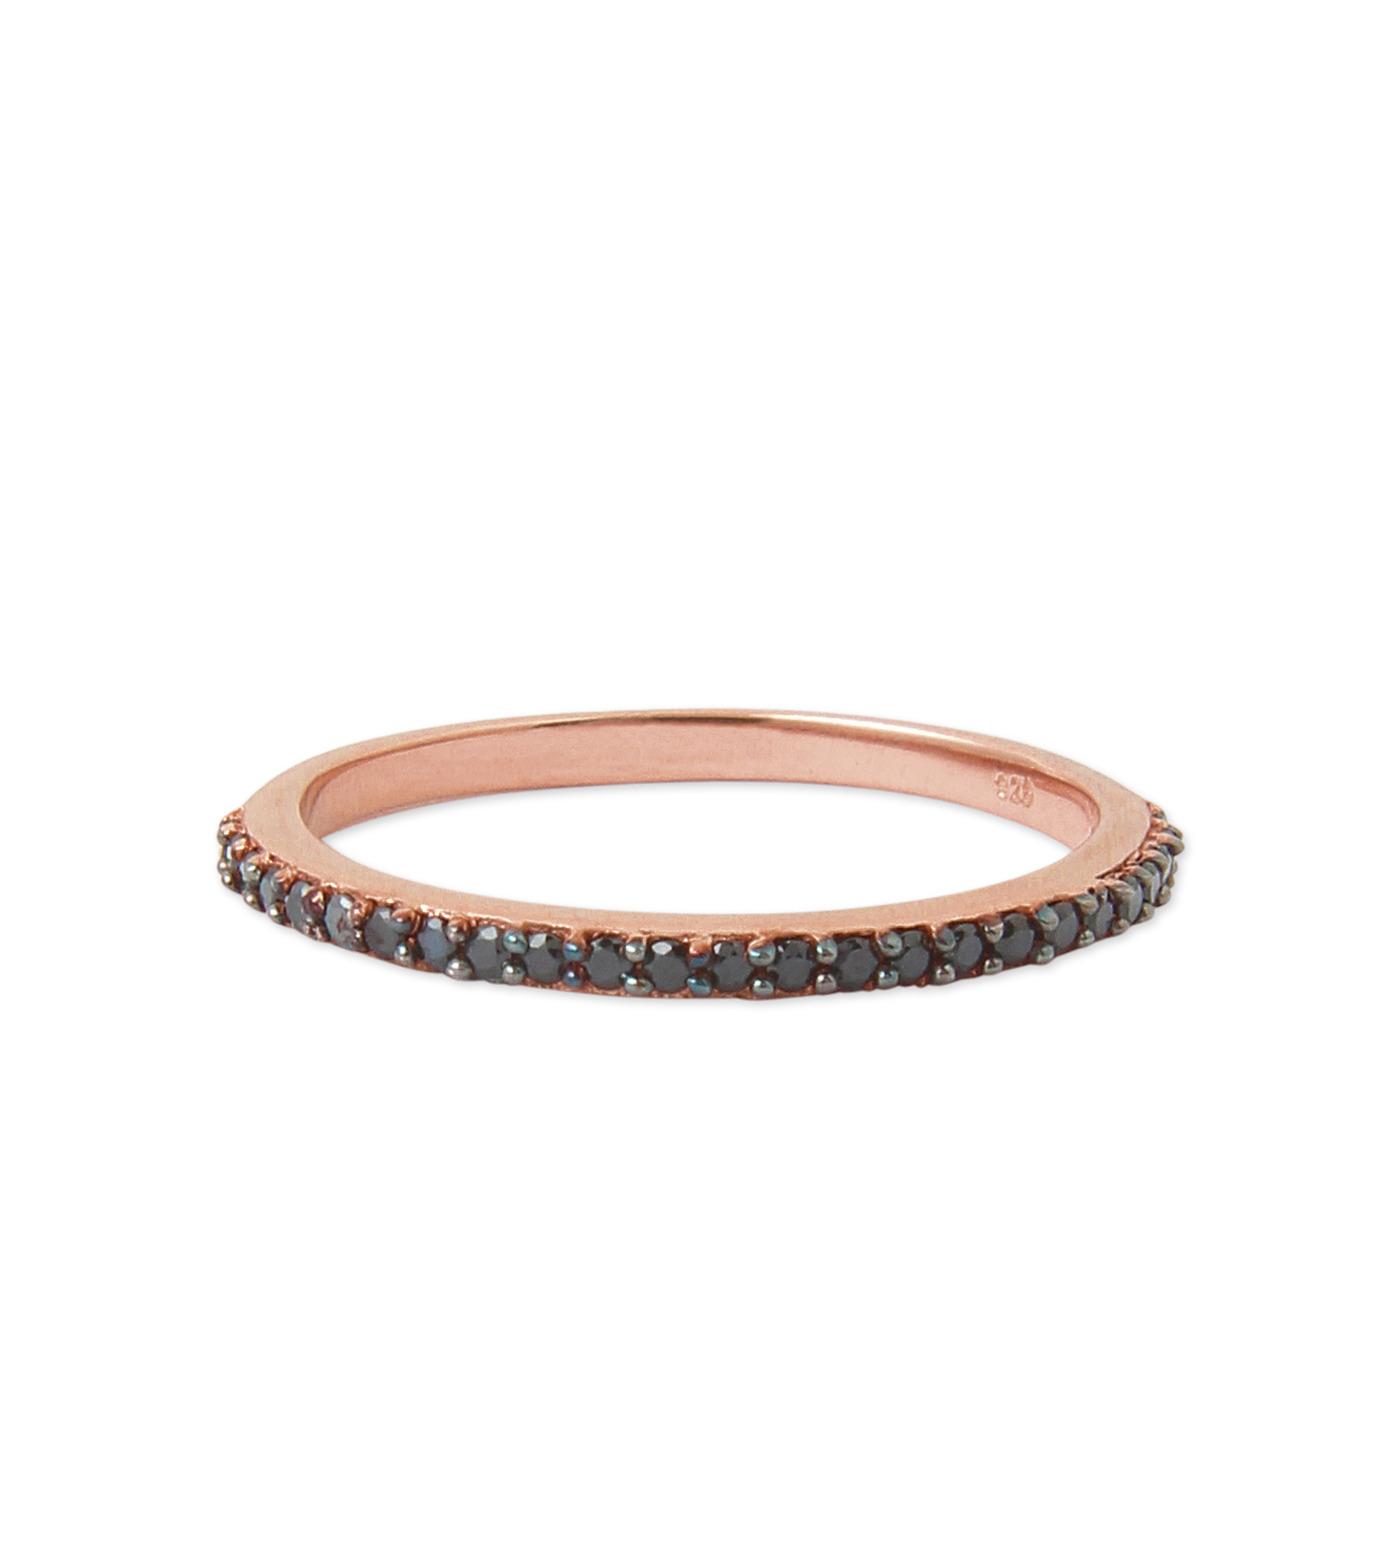 Priyanka(プリヤンカ)のSolitaire Ring-BLACK(リング/ring)-FR-003-13 拡大詳細画像1